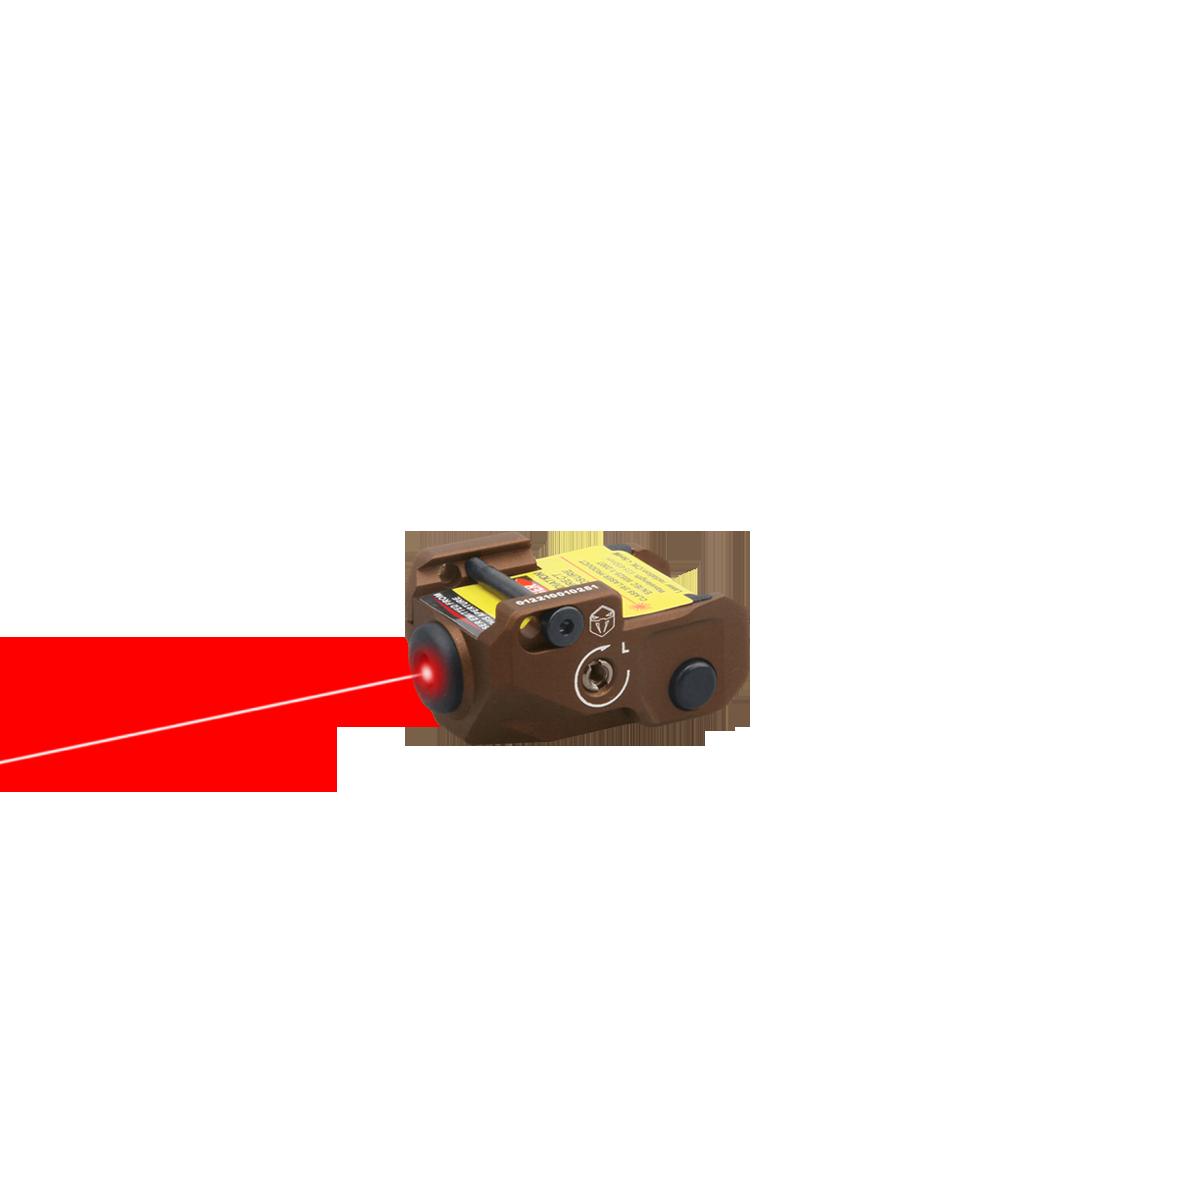 VipeRay Scrapper Subcompact Pistol Red Laser Sight